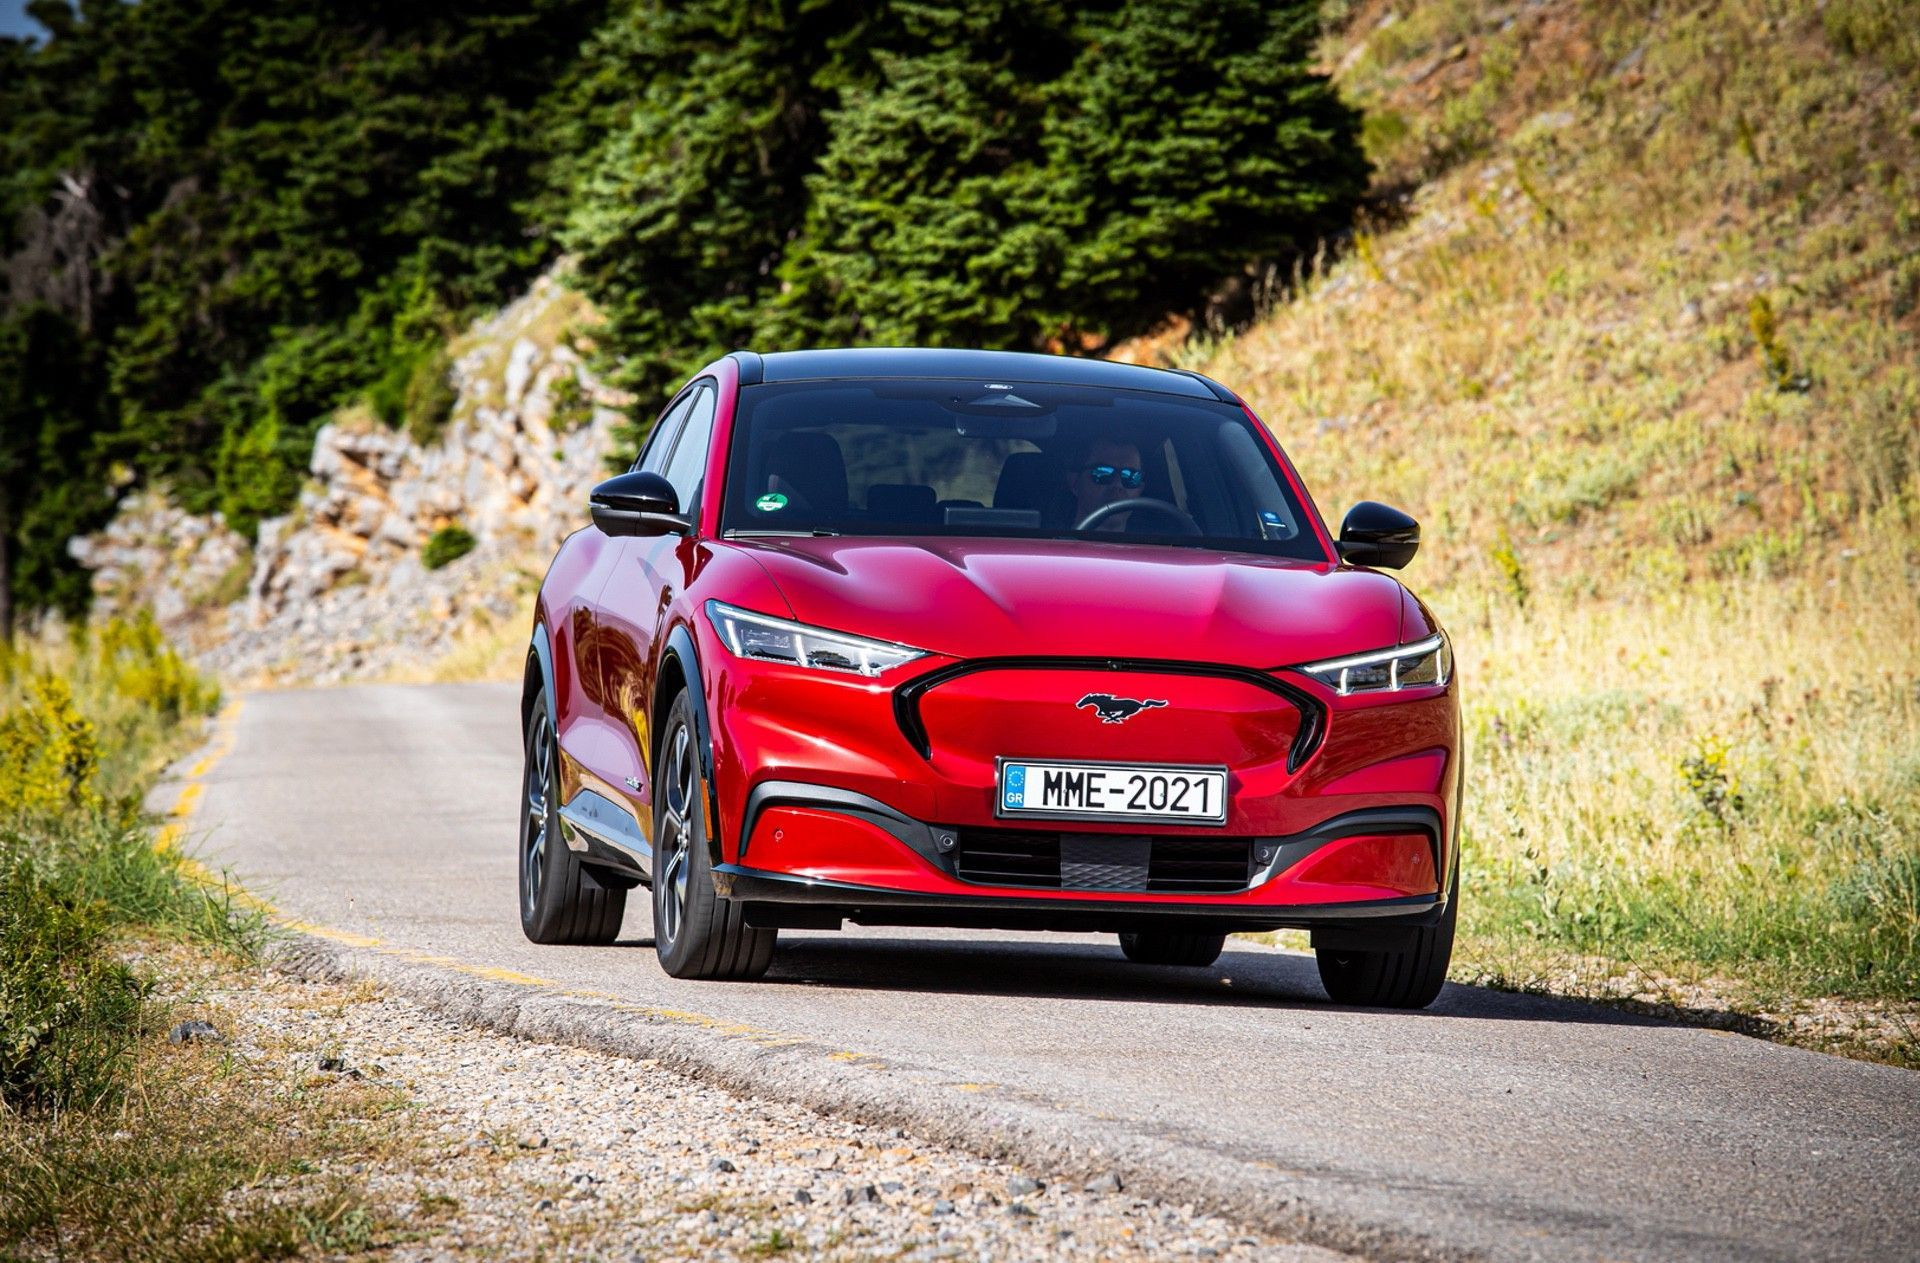 Ford_Mustang_Mach-E_greek_presskit-0144